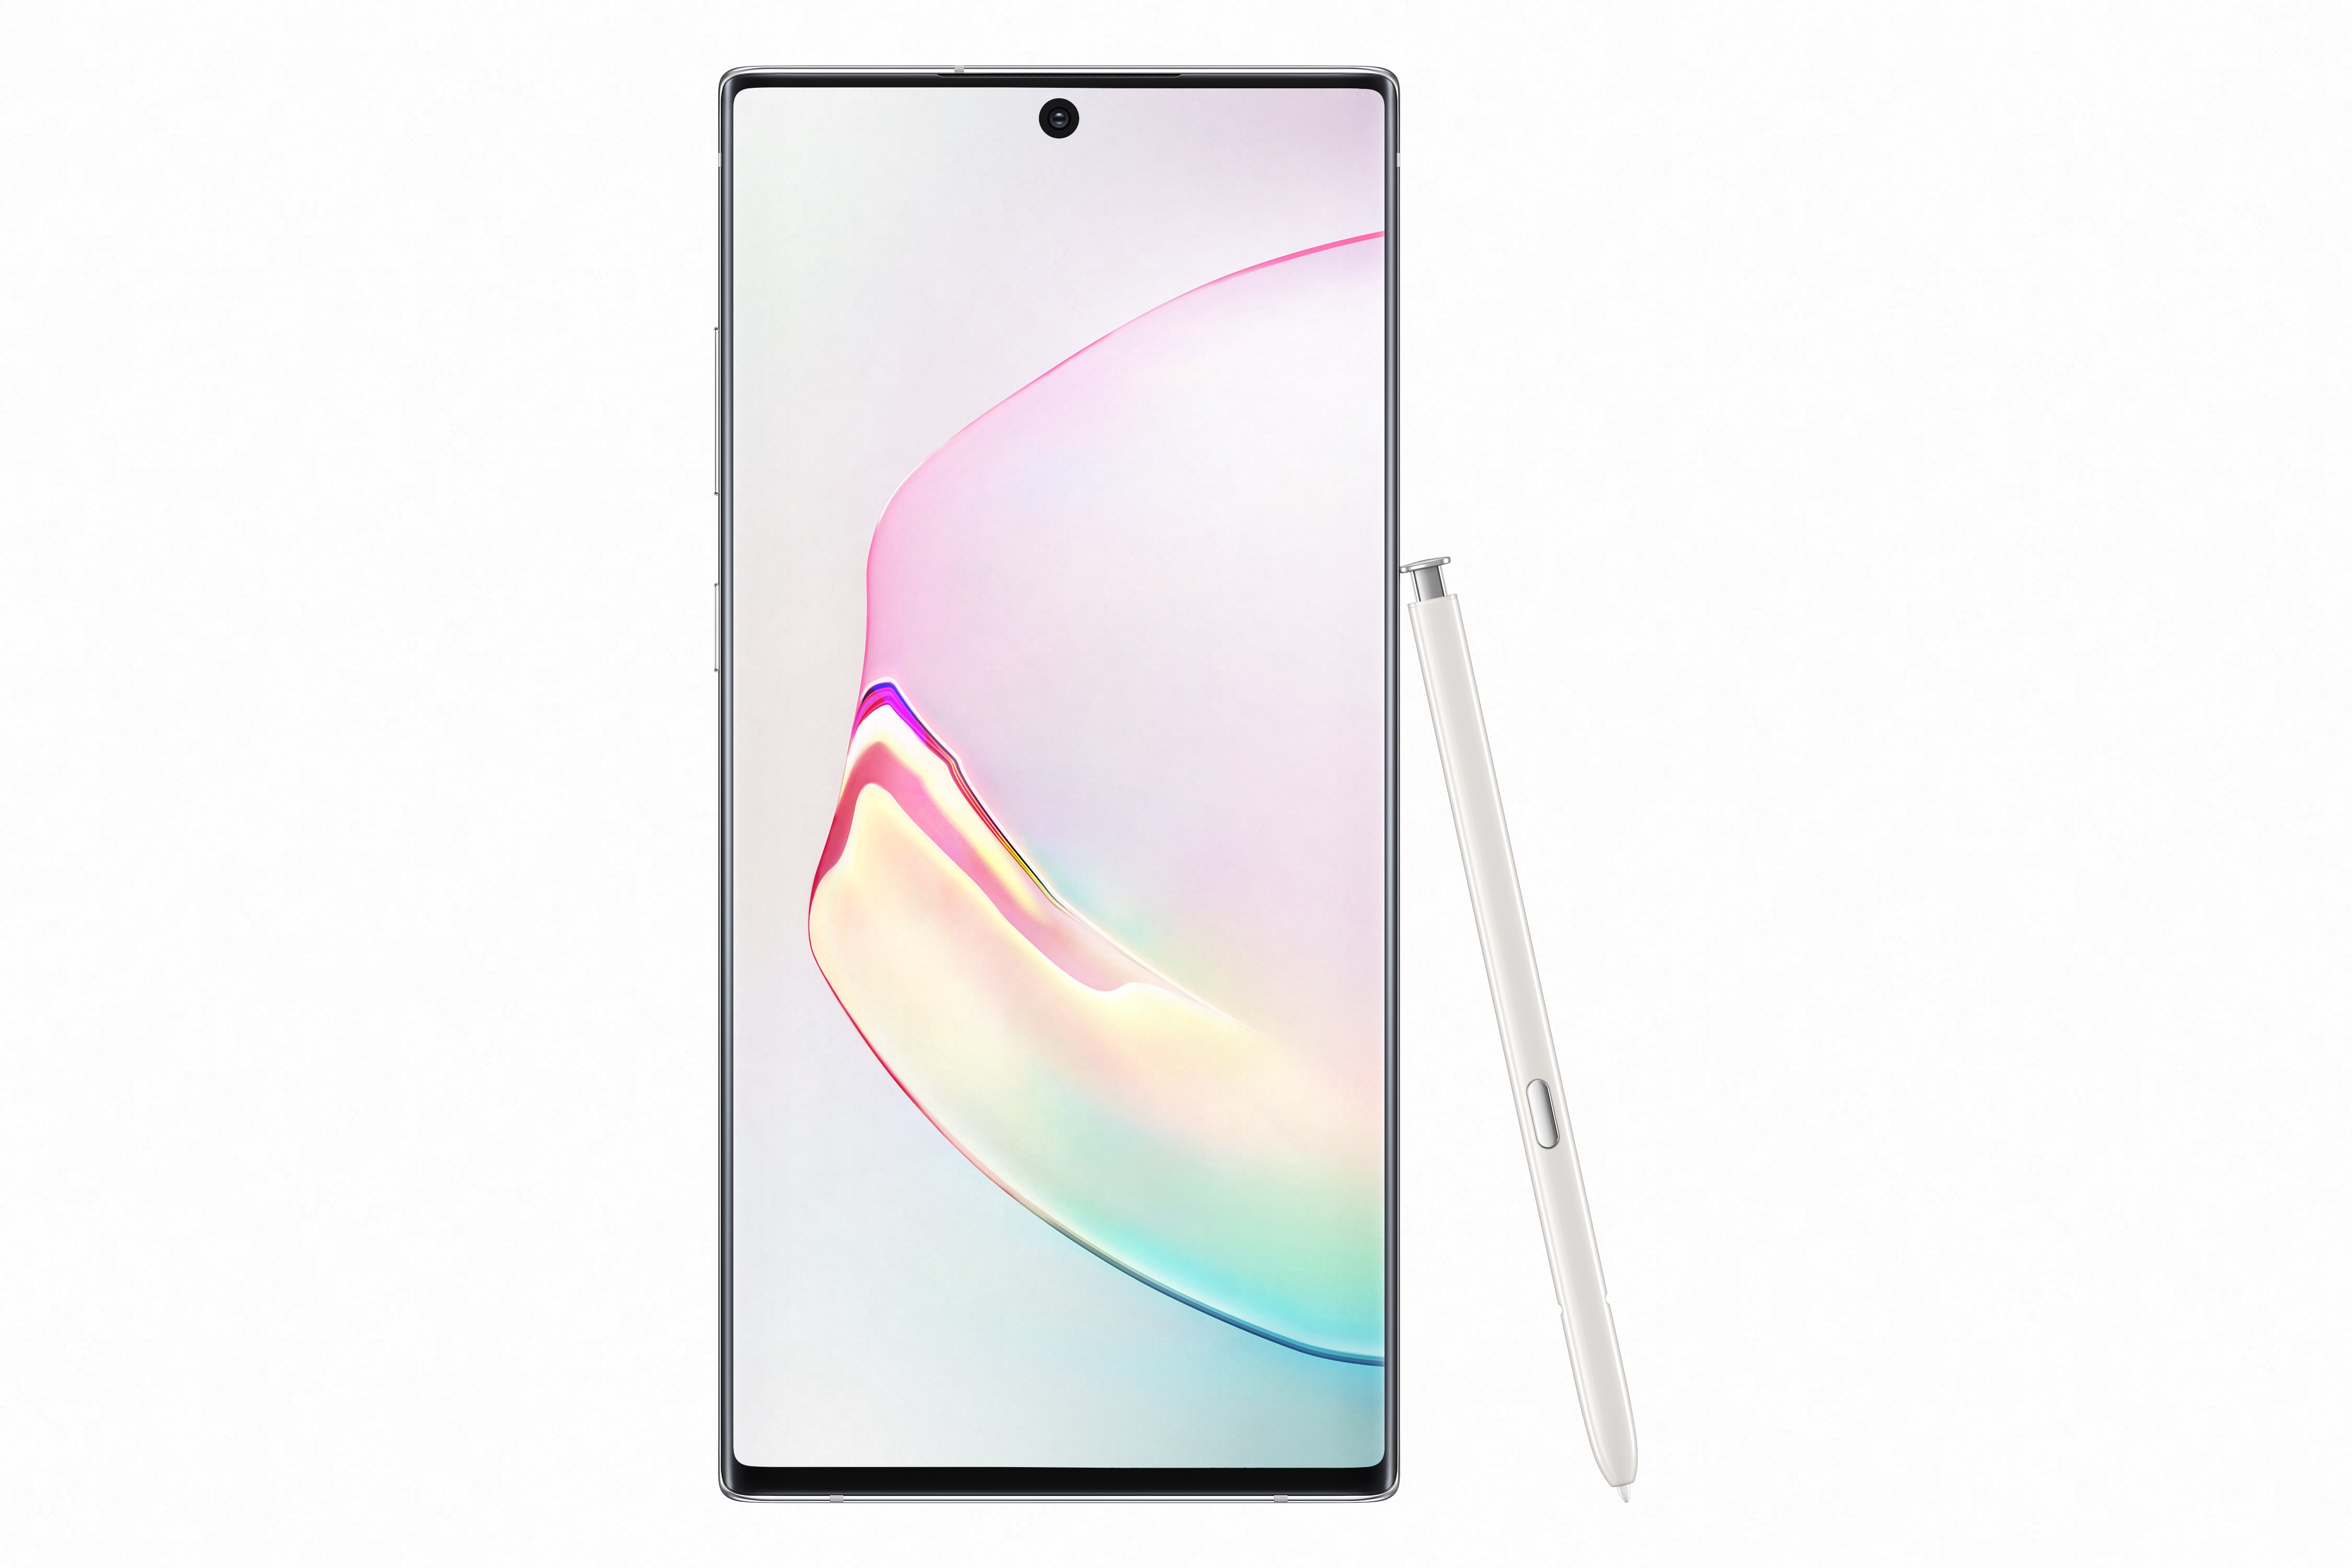 Galaxy Note 10+ image